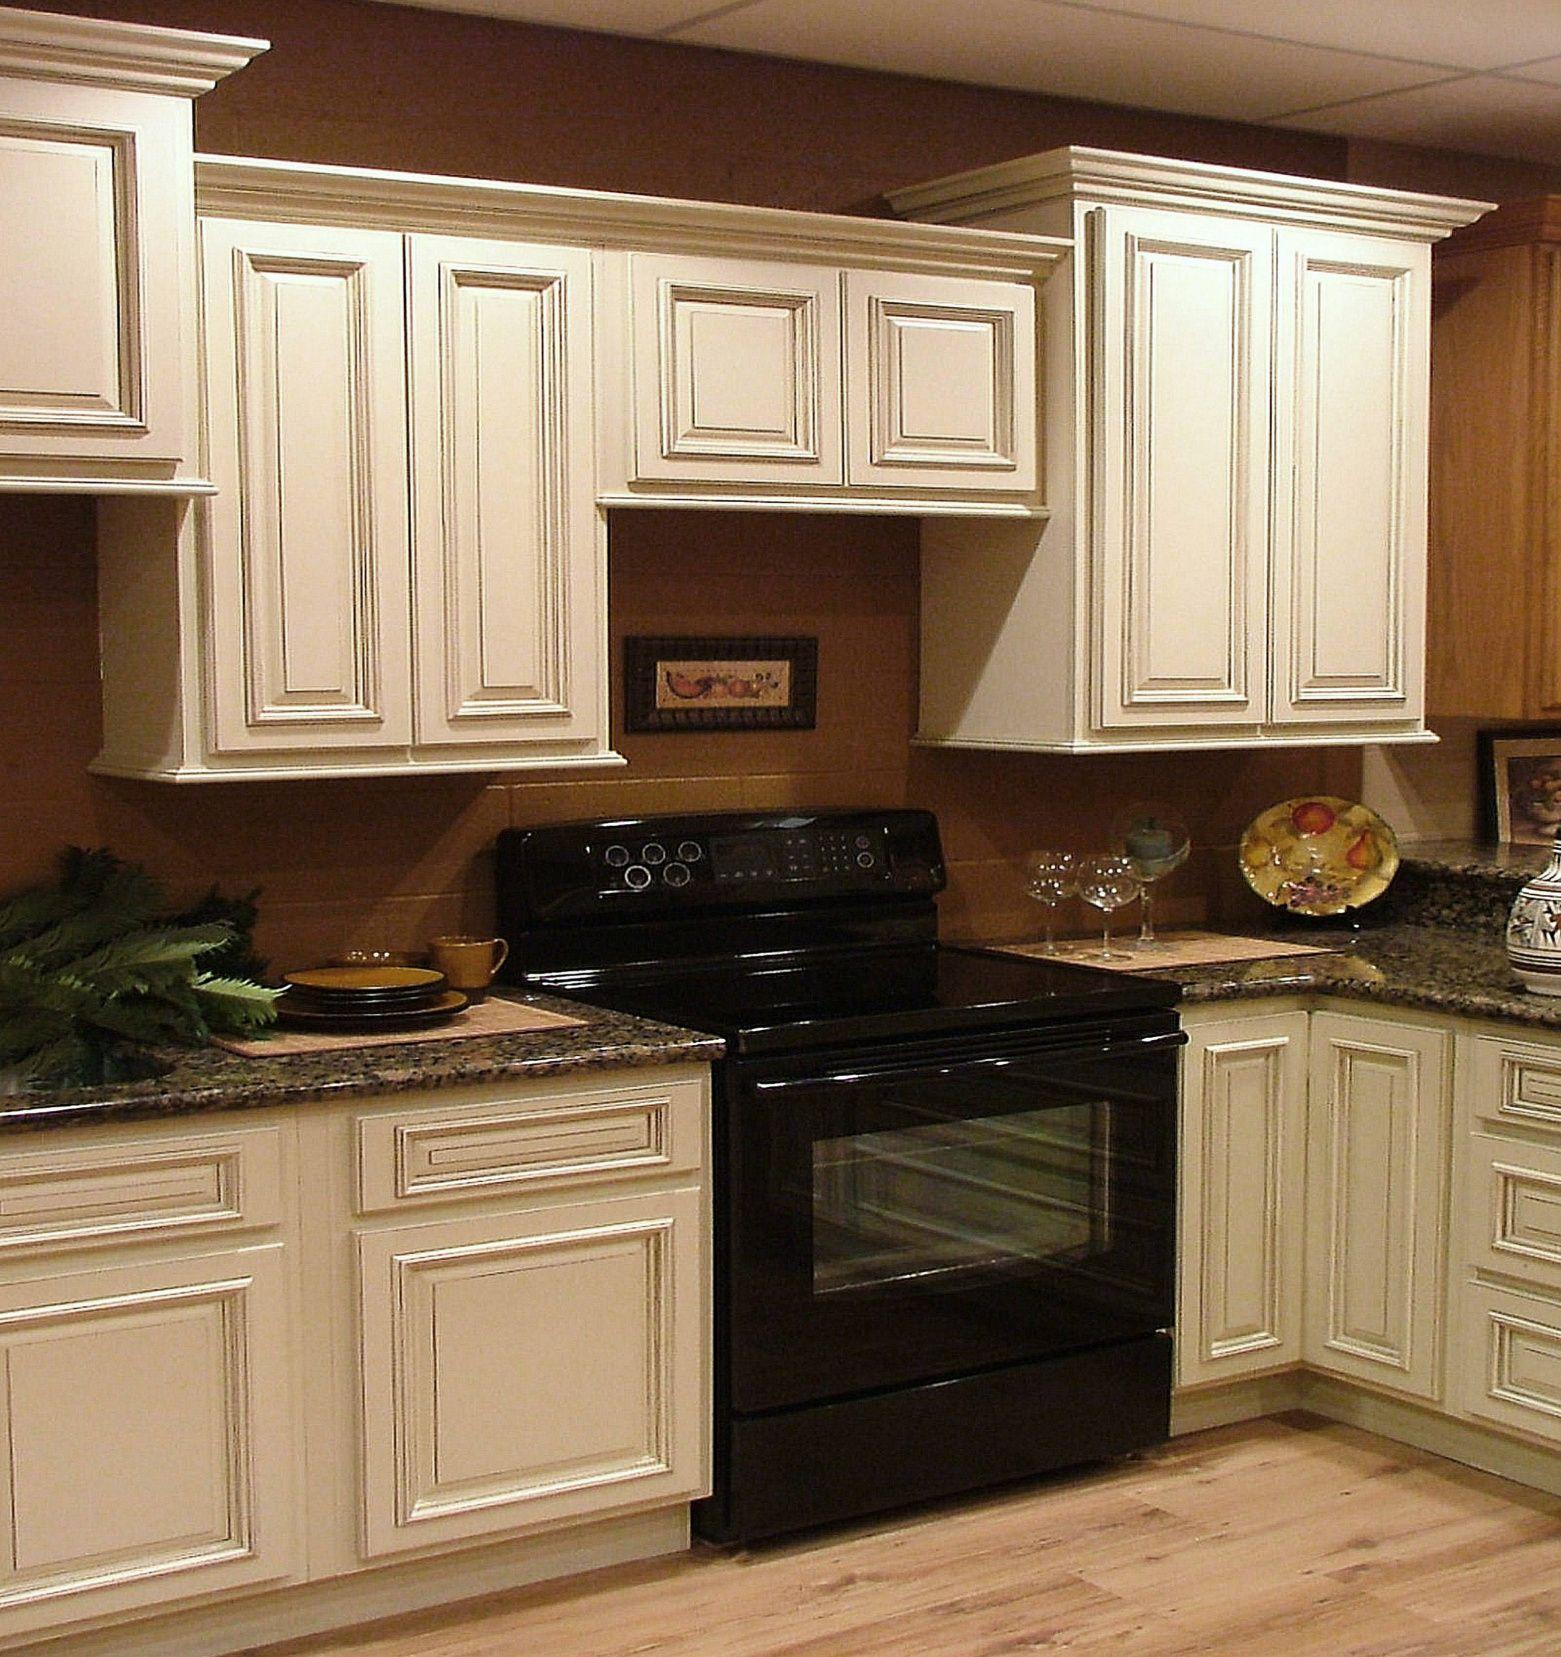 99+ Granite Countertop Caps - Backsplash for Kitchen Ideas ...